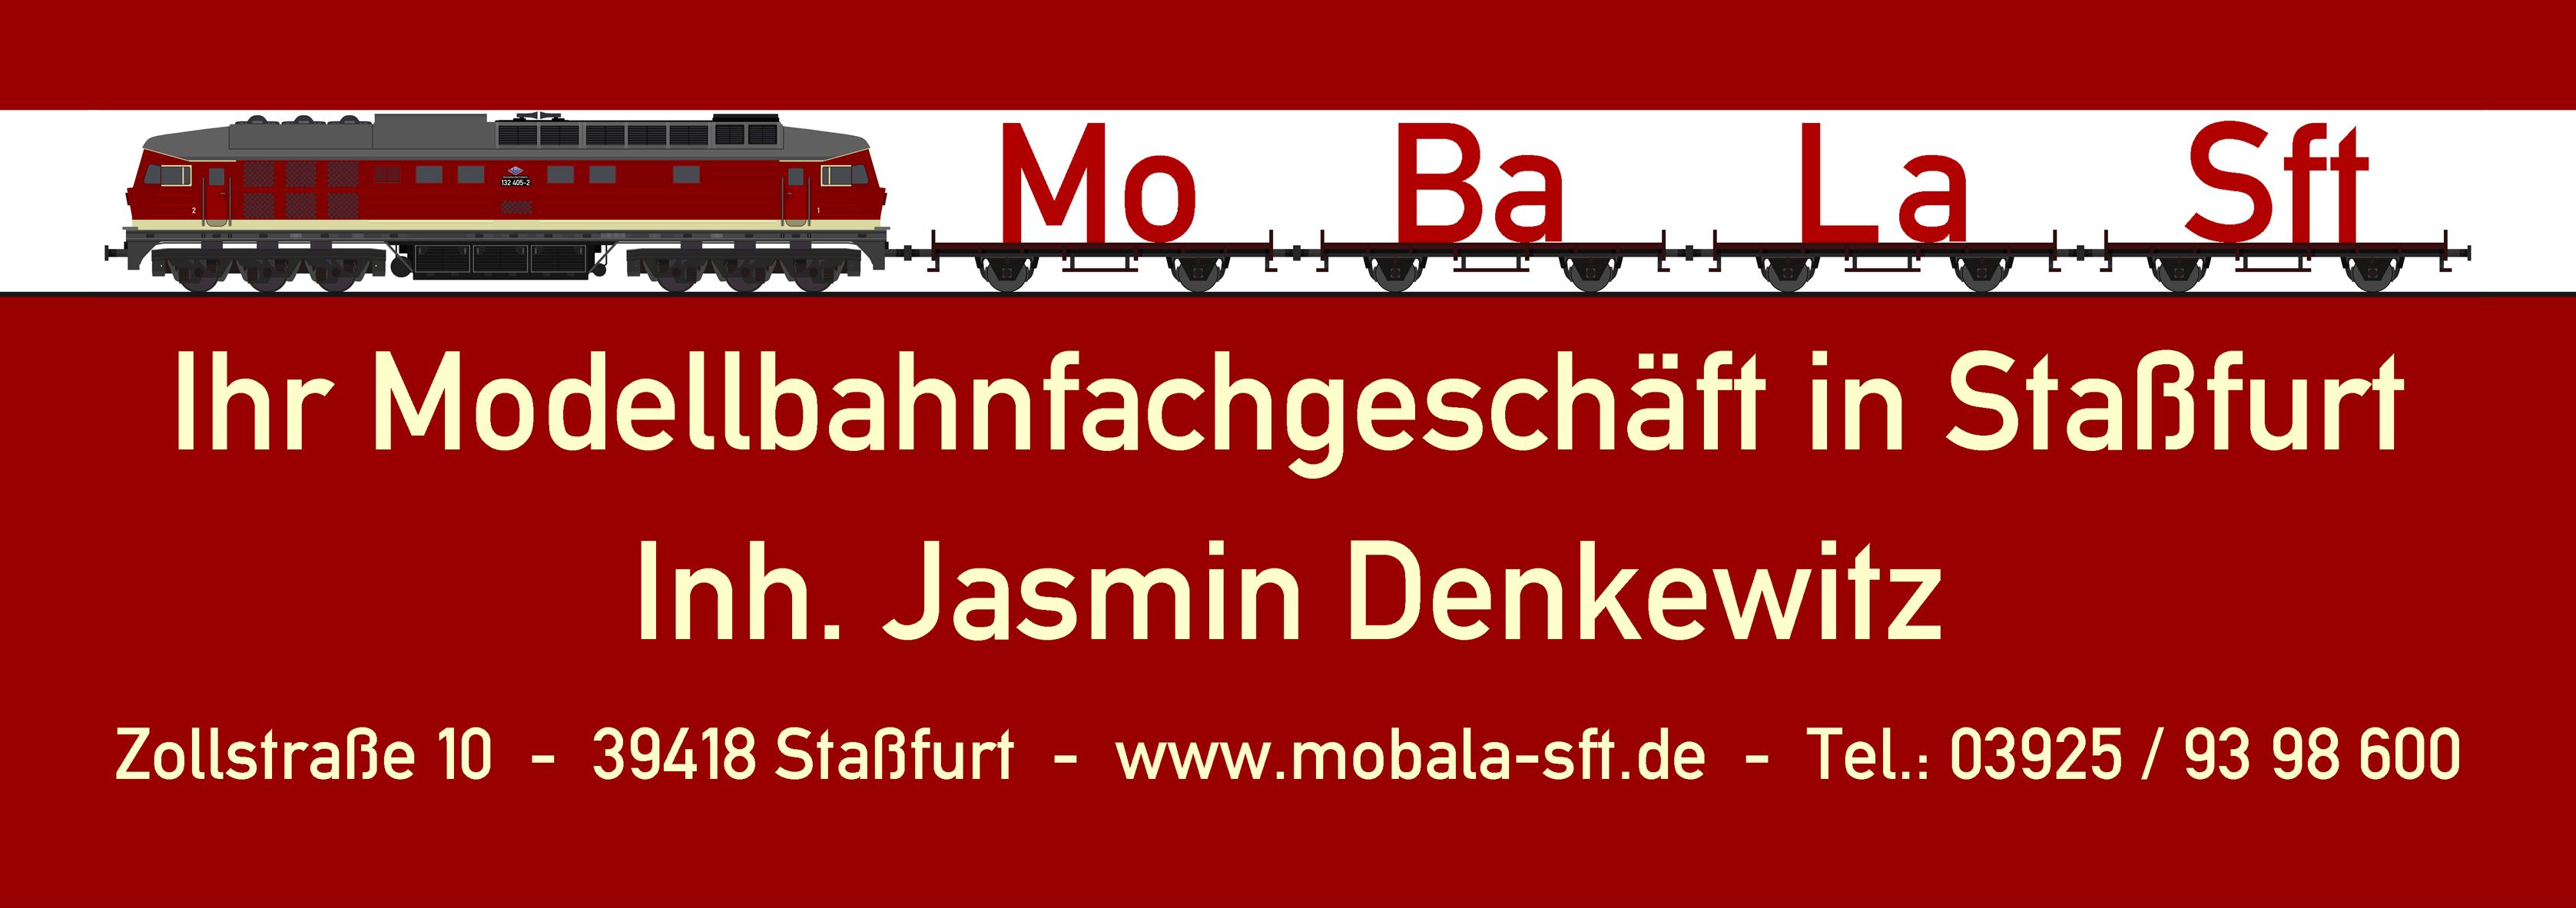 Modellbahnland-Stassfurt-Banner